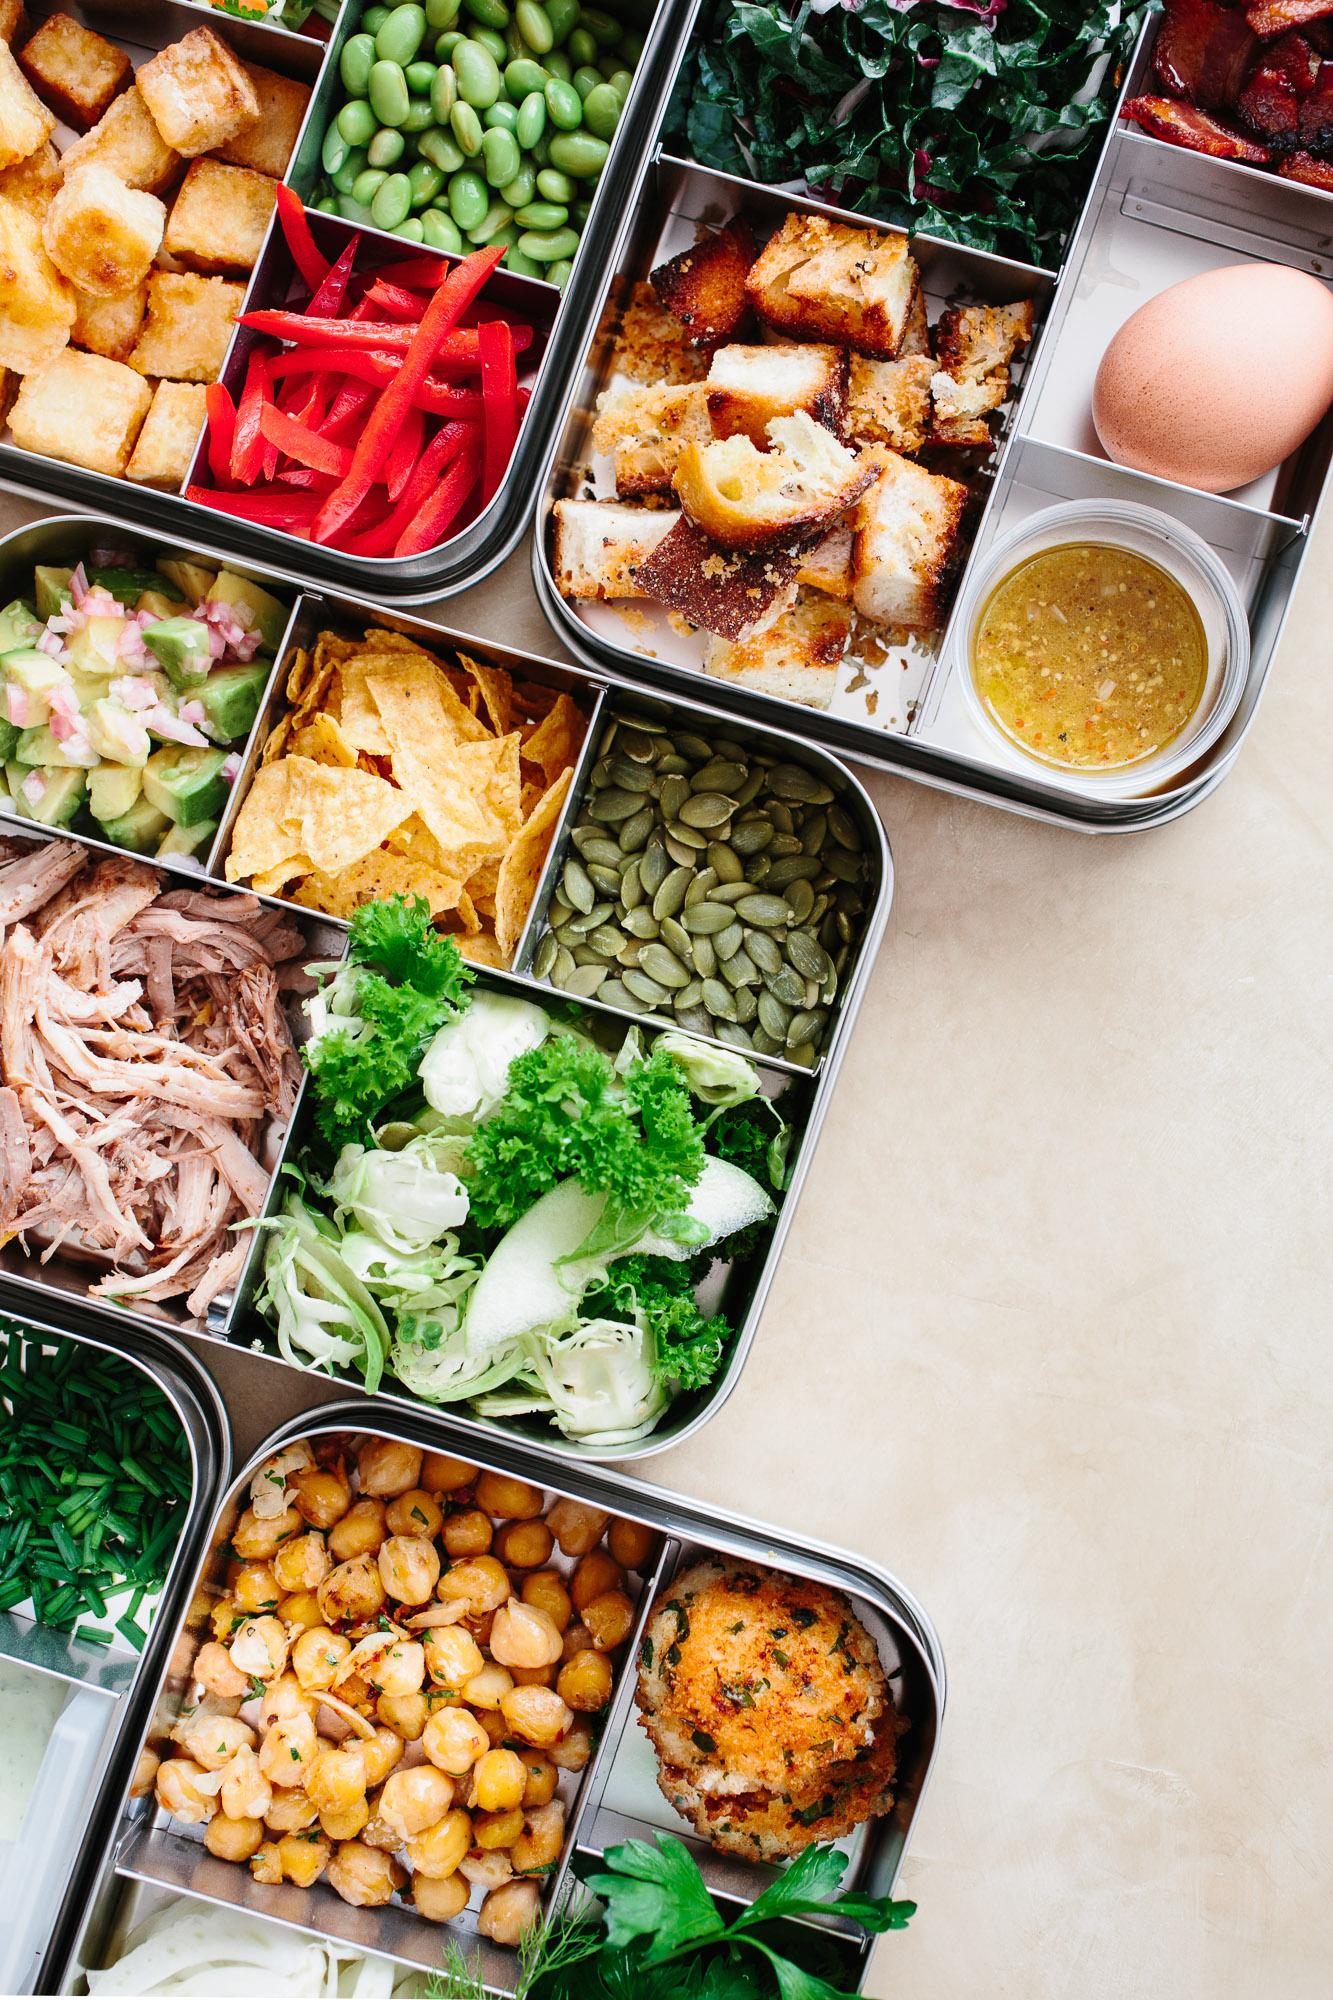 Kitchn | Inspiring cooks, nourishing homes